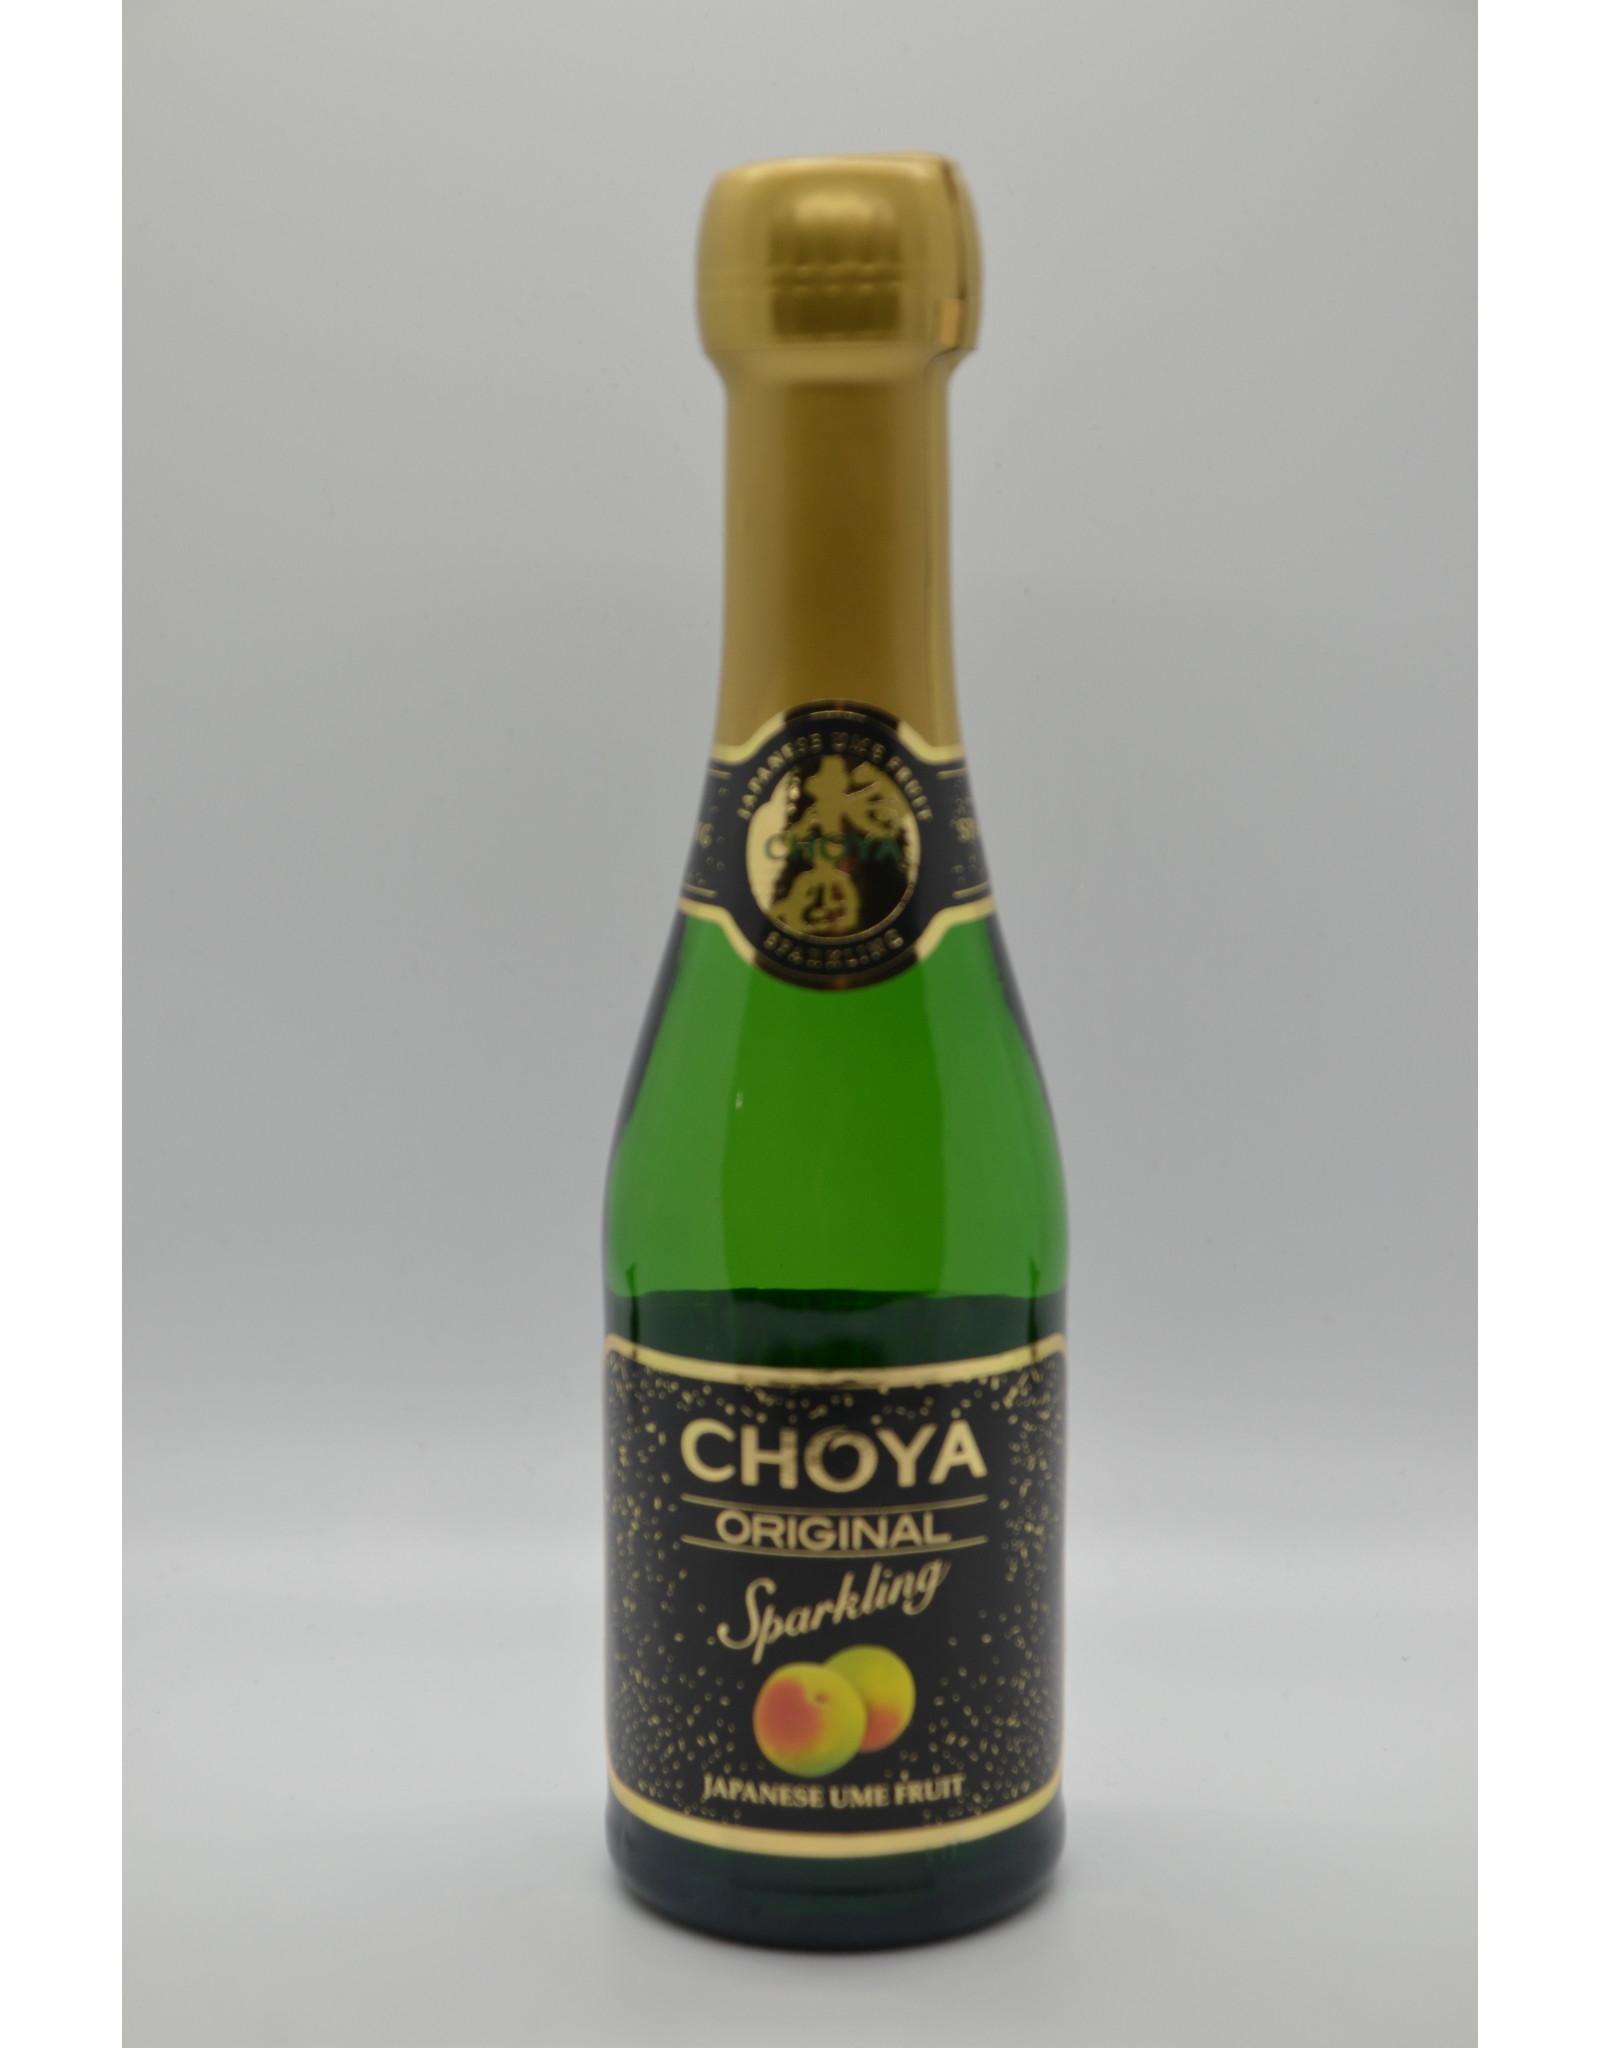 Japan Choya Original Sparkling 187ml